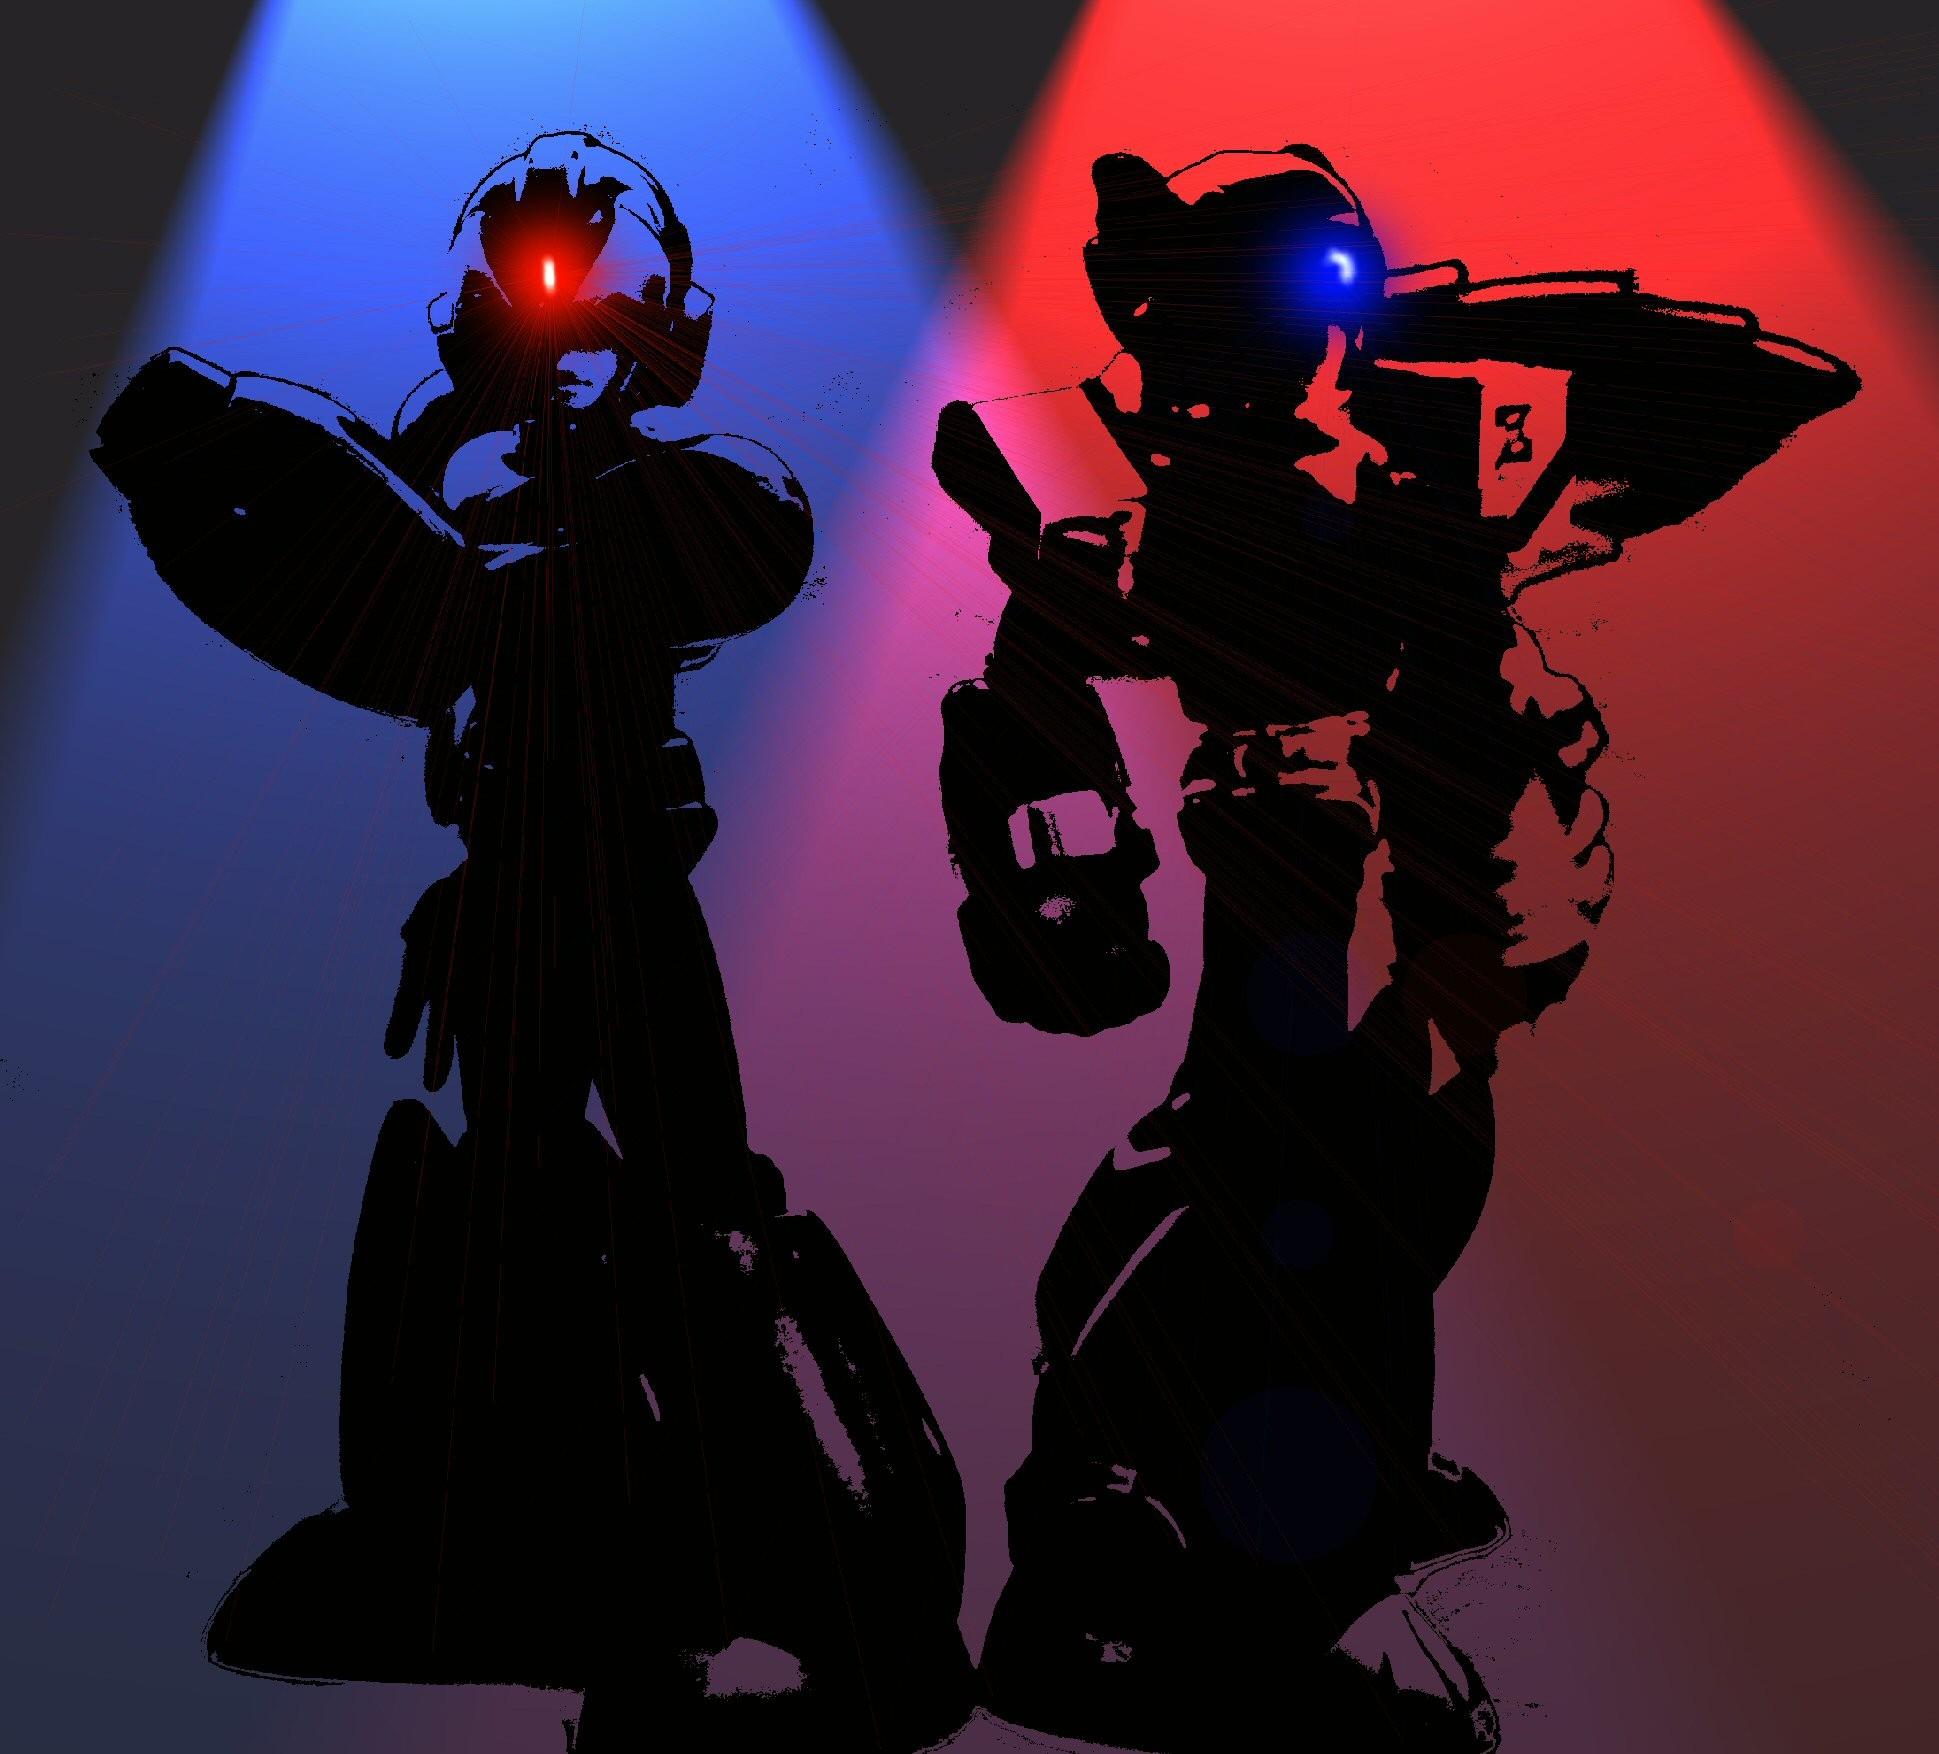 Mega Man X and Zero by basil6md on DeviantArt